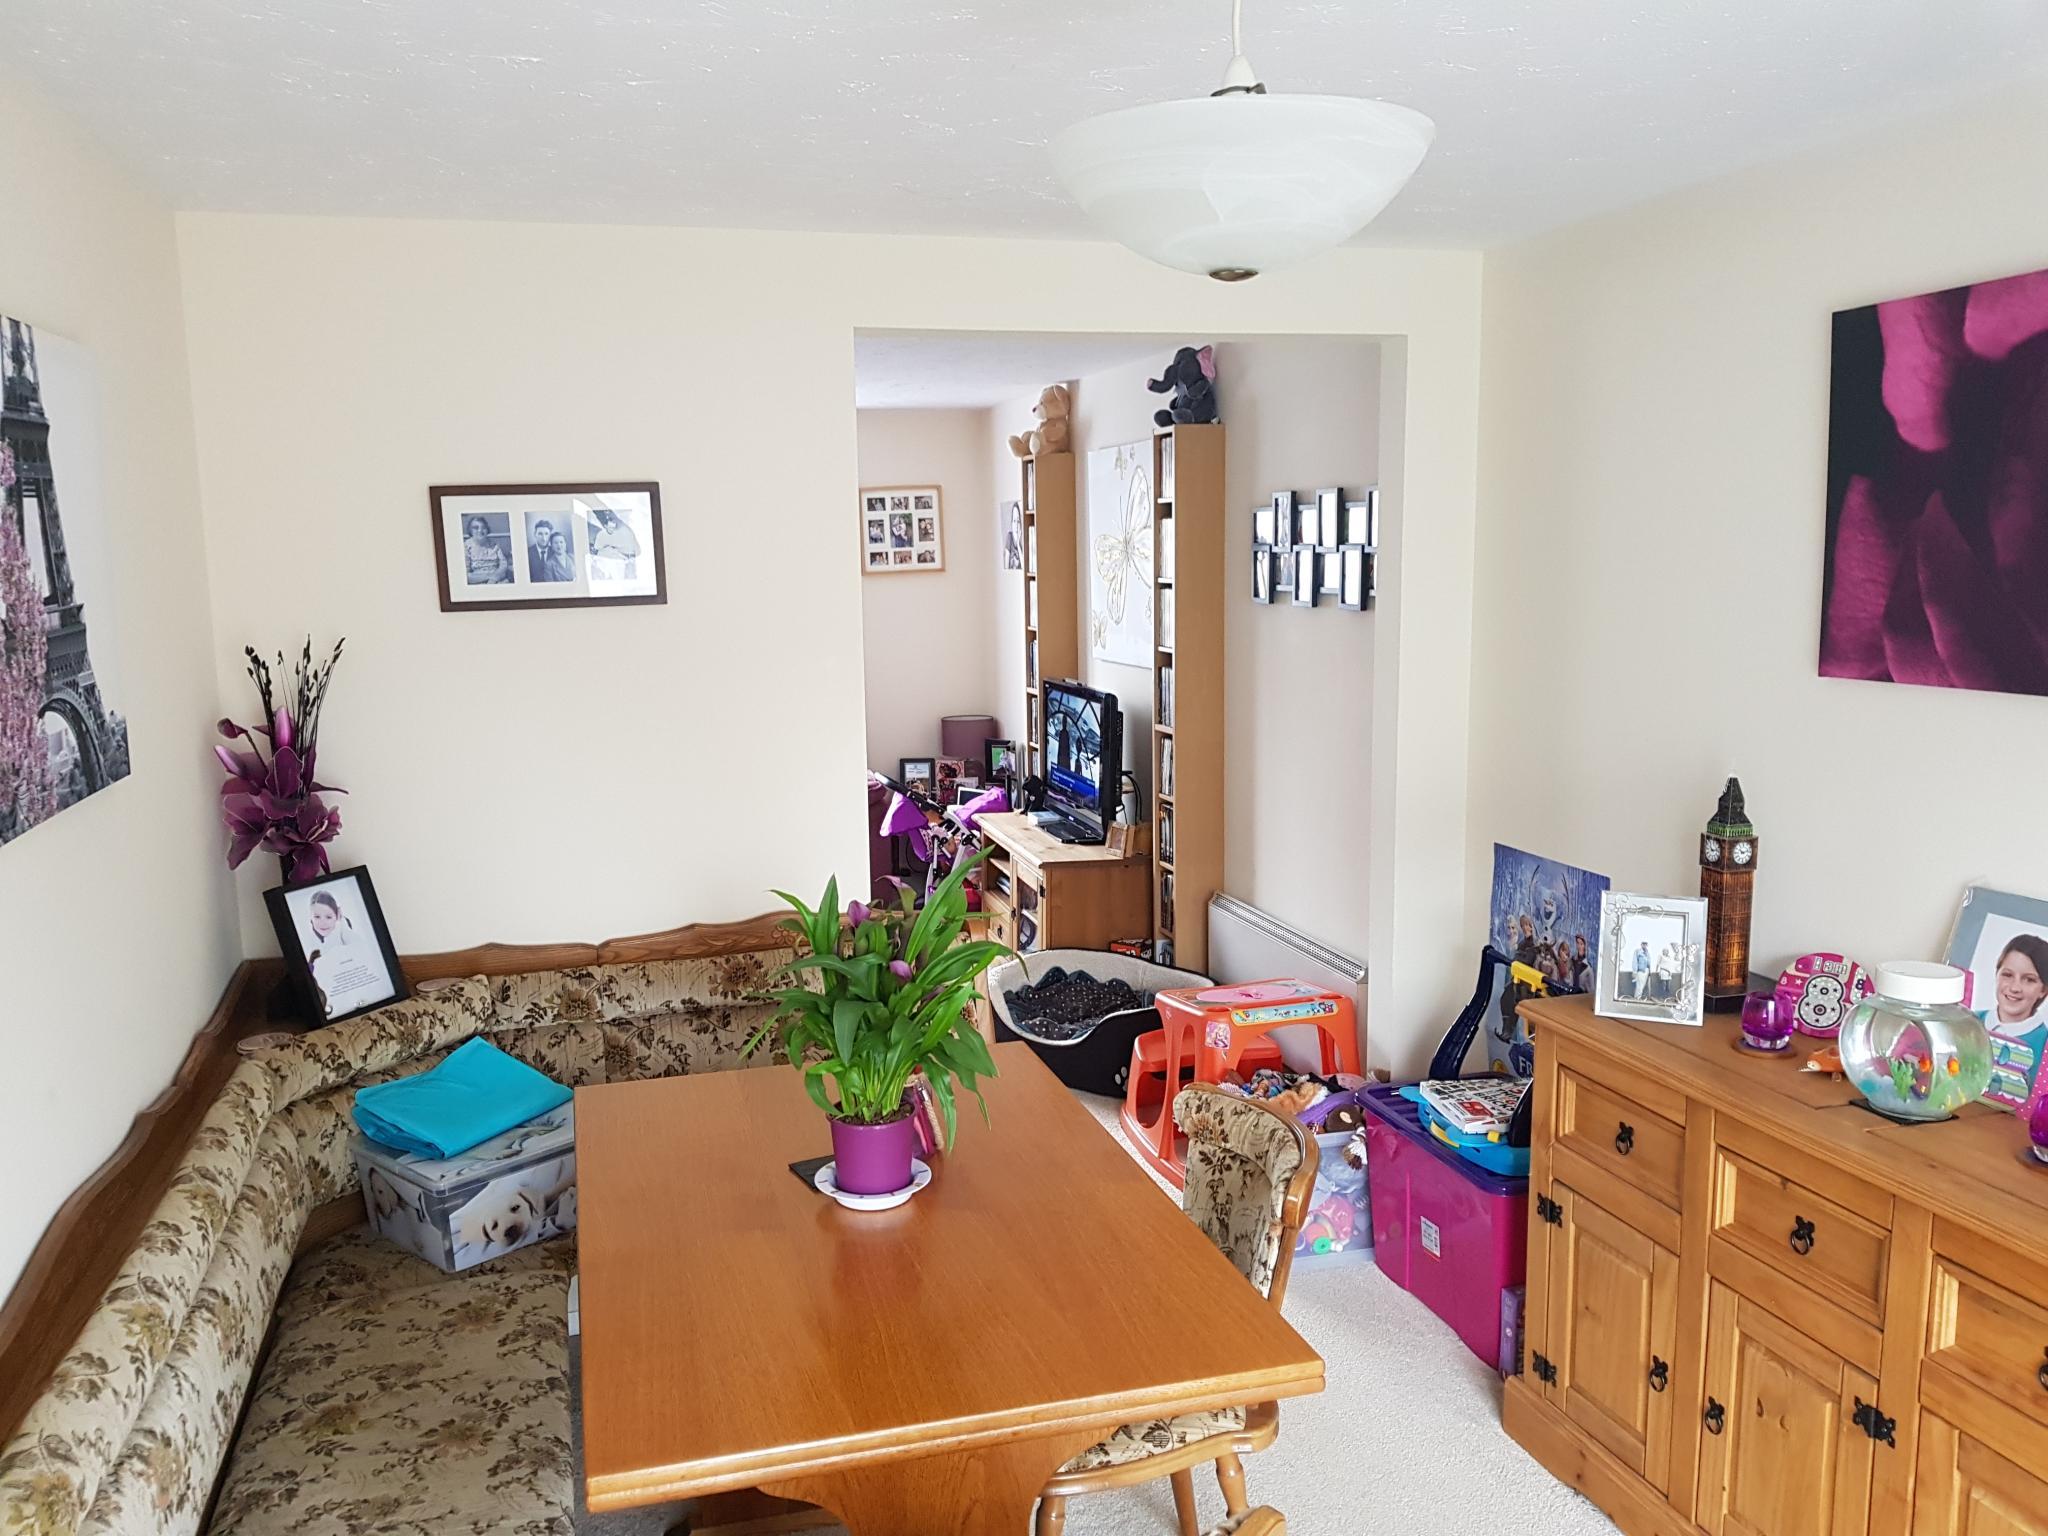 2 bedroom semi-detached house SSTC in Rendlesham, Woodbridge - Photograph 4